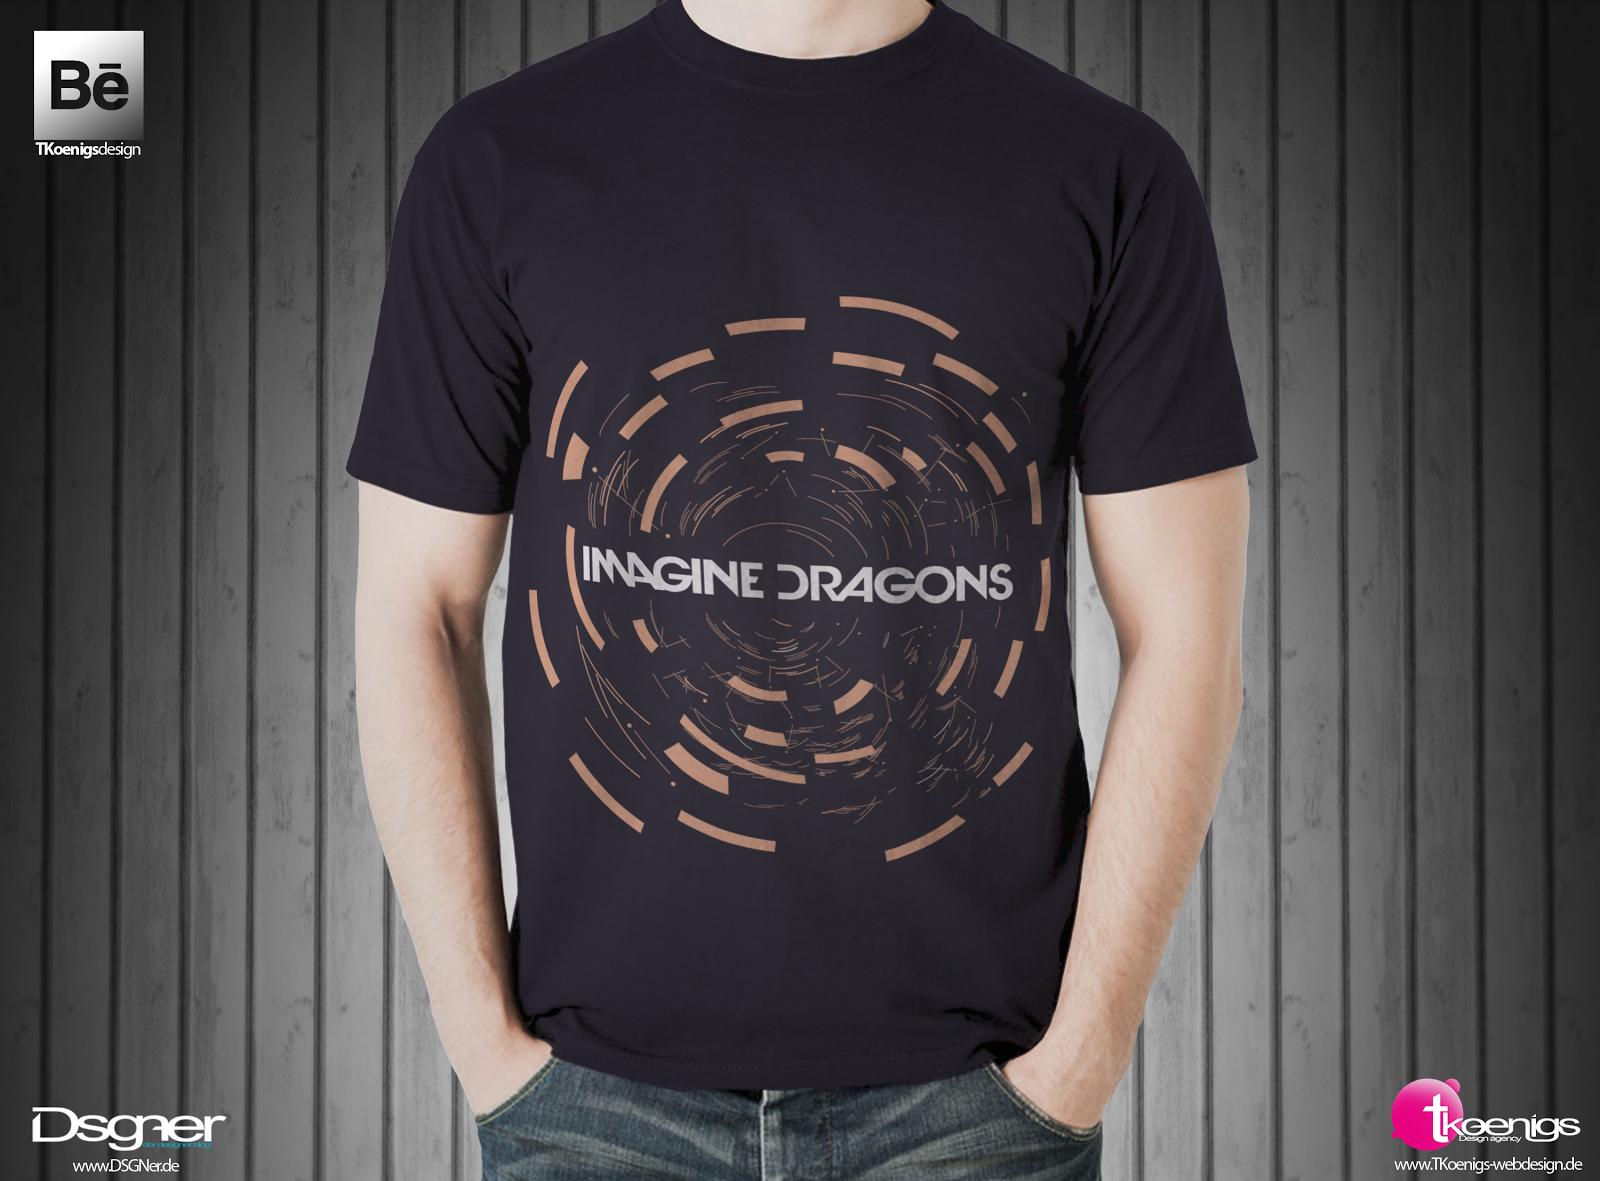 Pham_shirt_mockup02.png